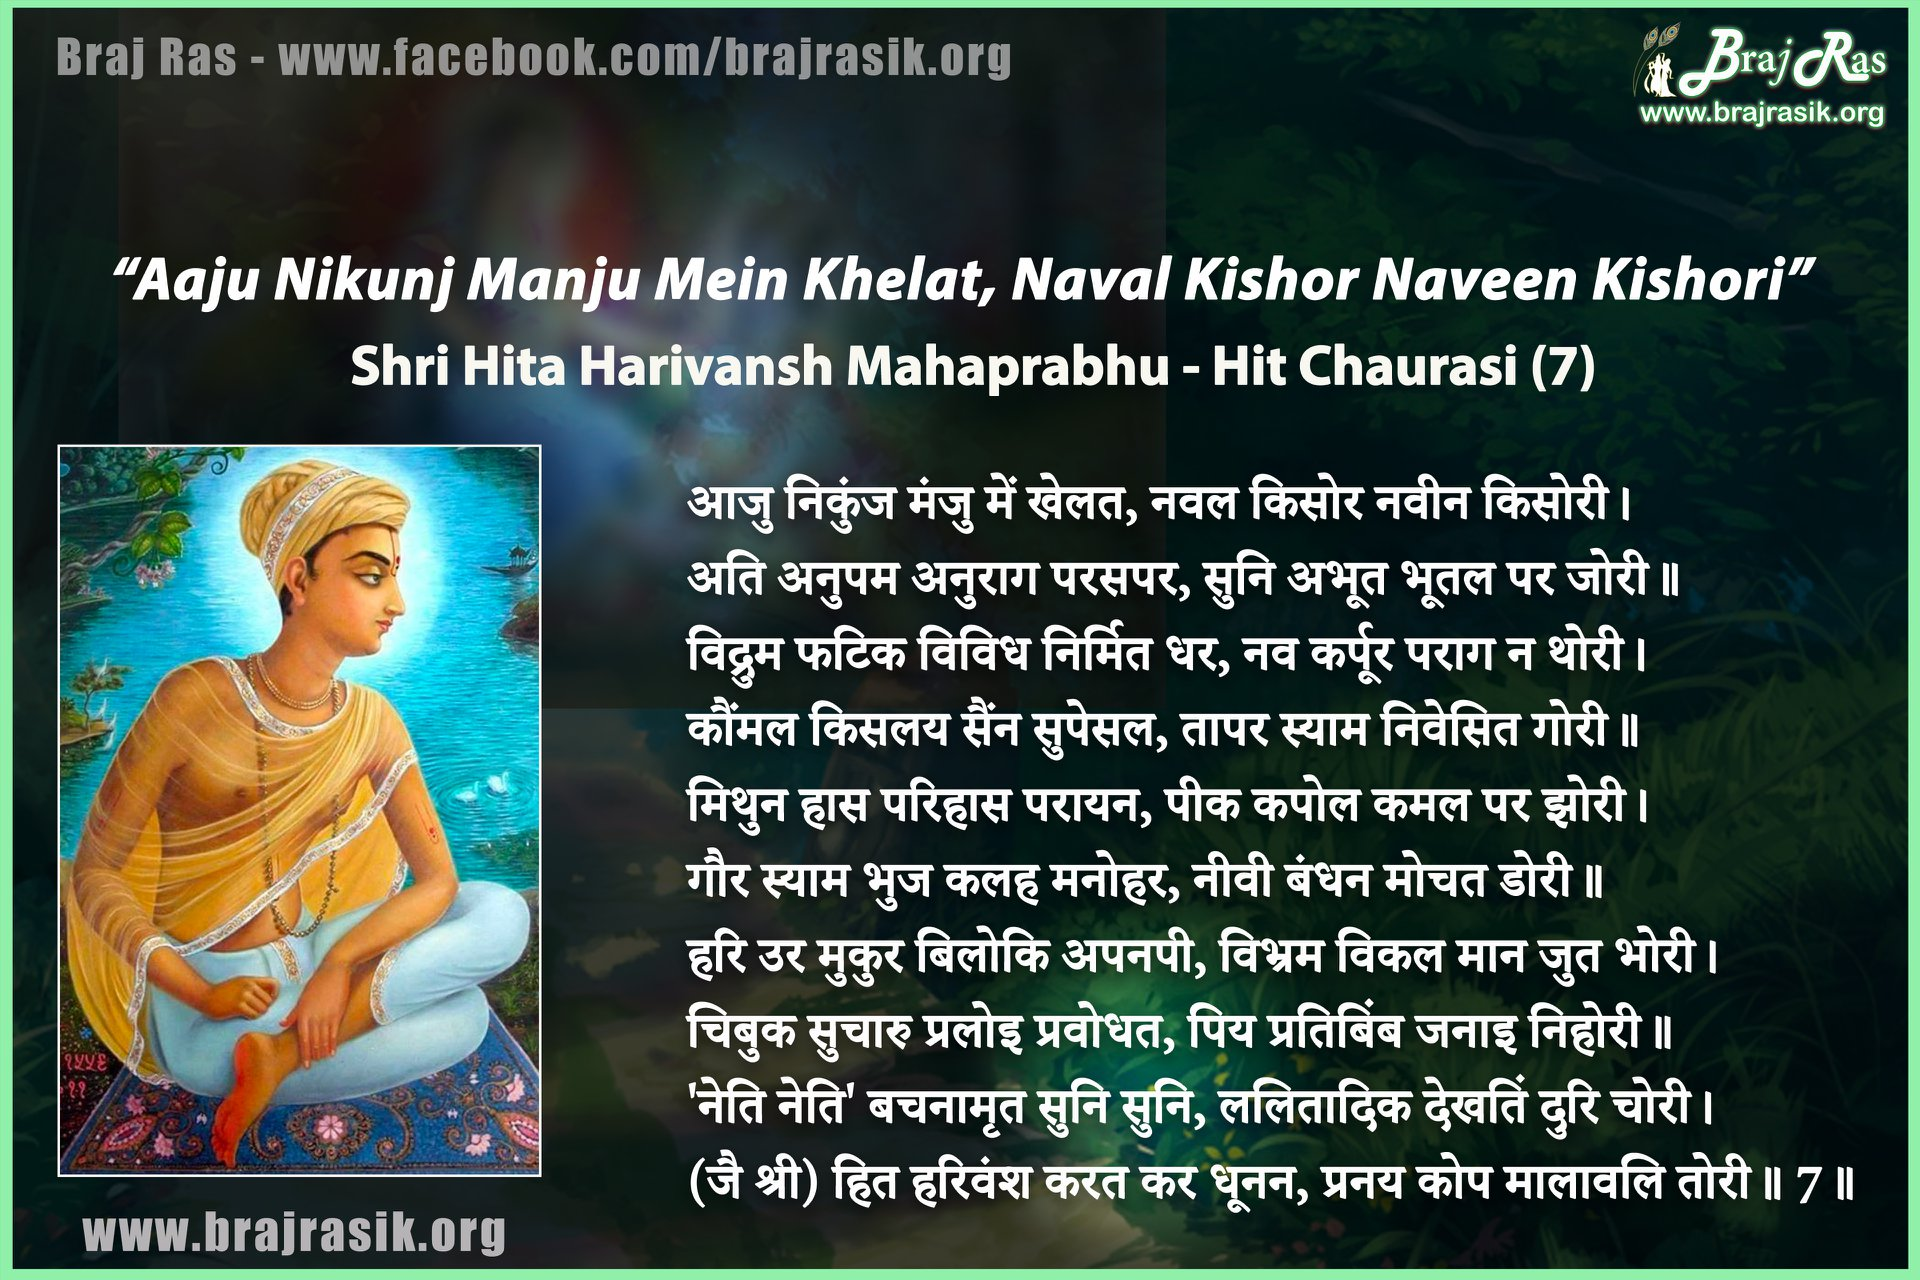 Aaju Nikunj Manju Mein Khelat - Shri Hita Harivansh Mahaprabhu, Hit Chaturasi